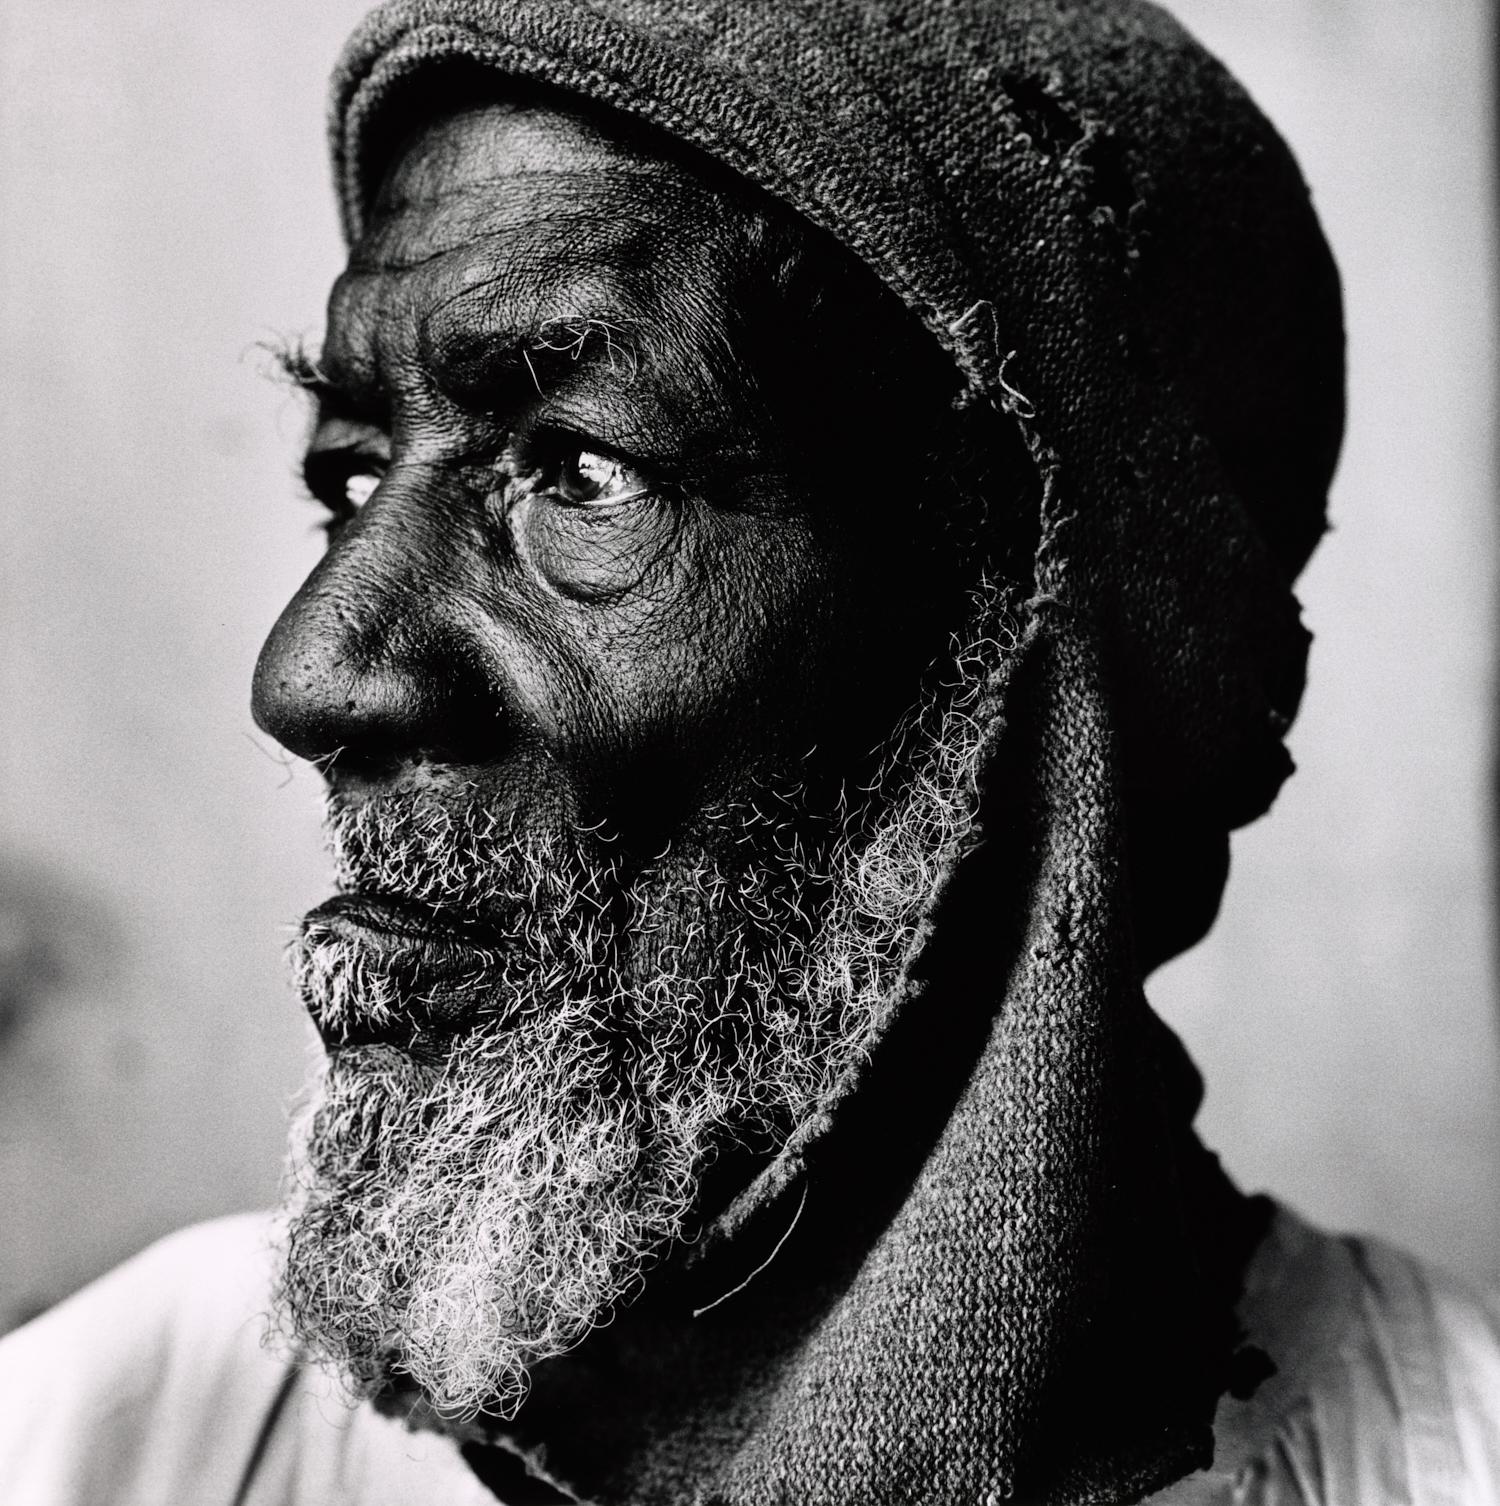 Old Dahomey Man (A) , 1967 Gelatin silver print © The Irving Penn Foundation